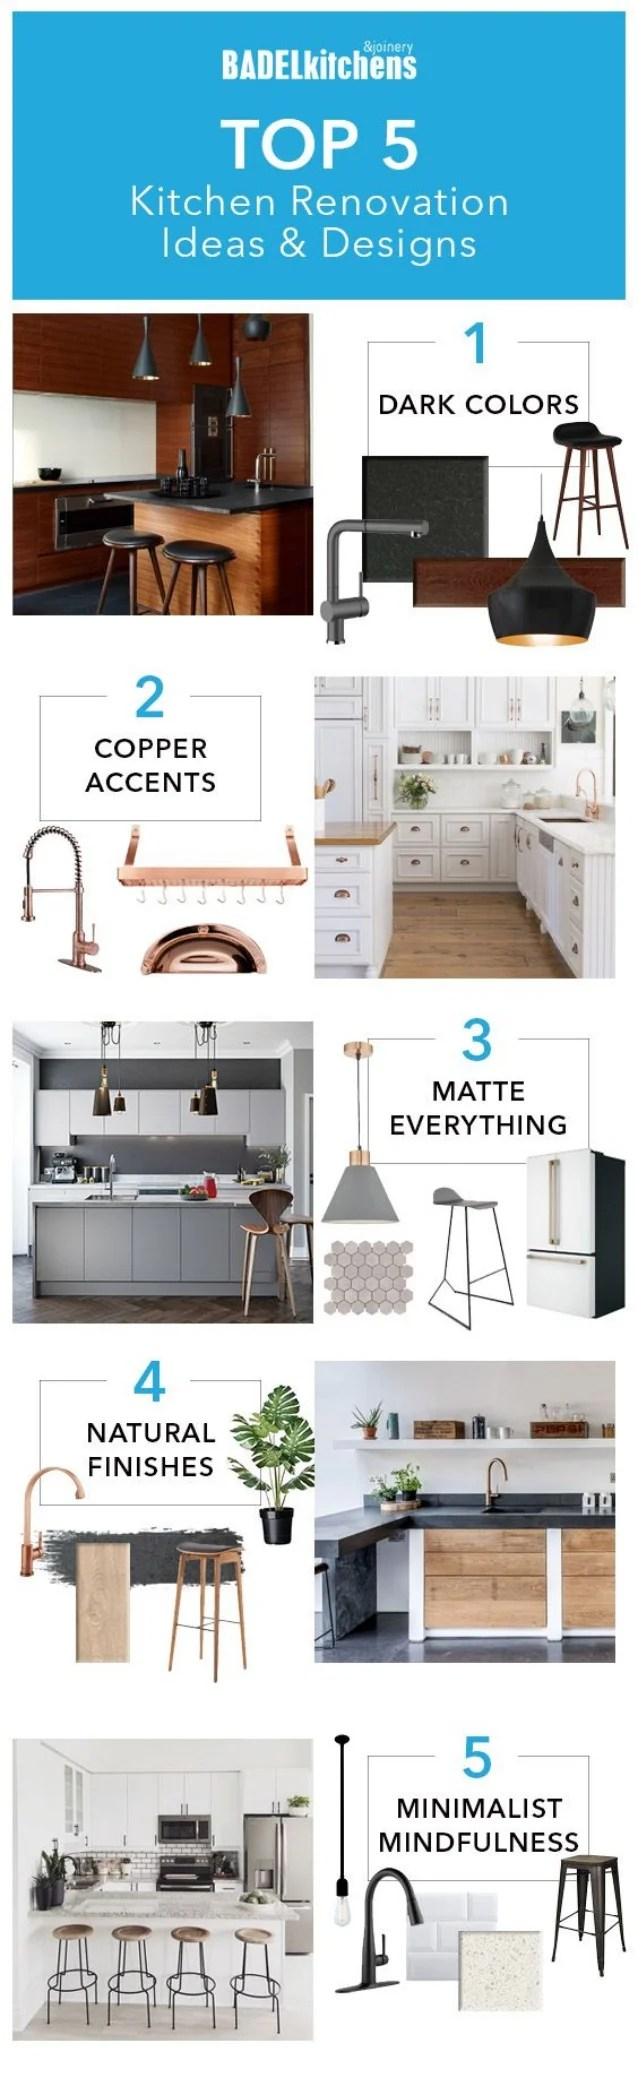 Top 5 Kitchen Renovation Ideas Designs